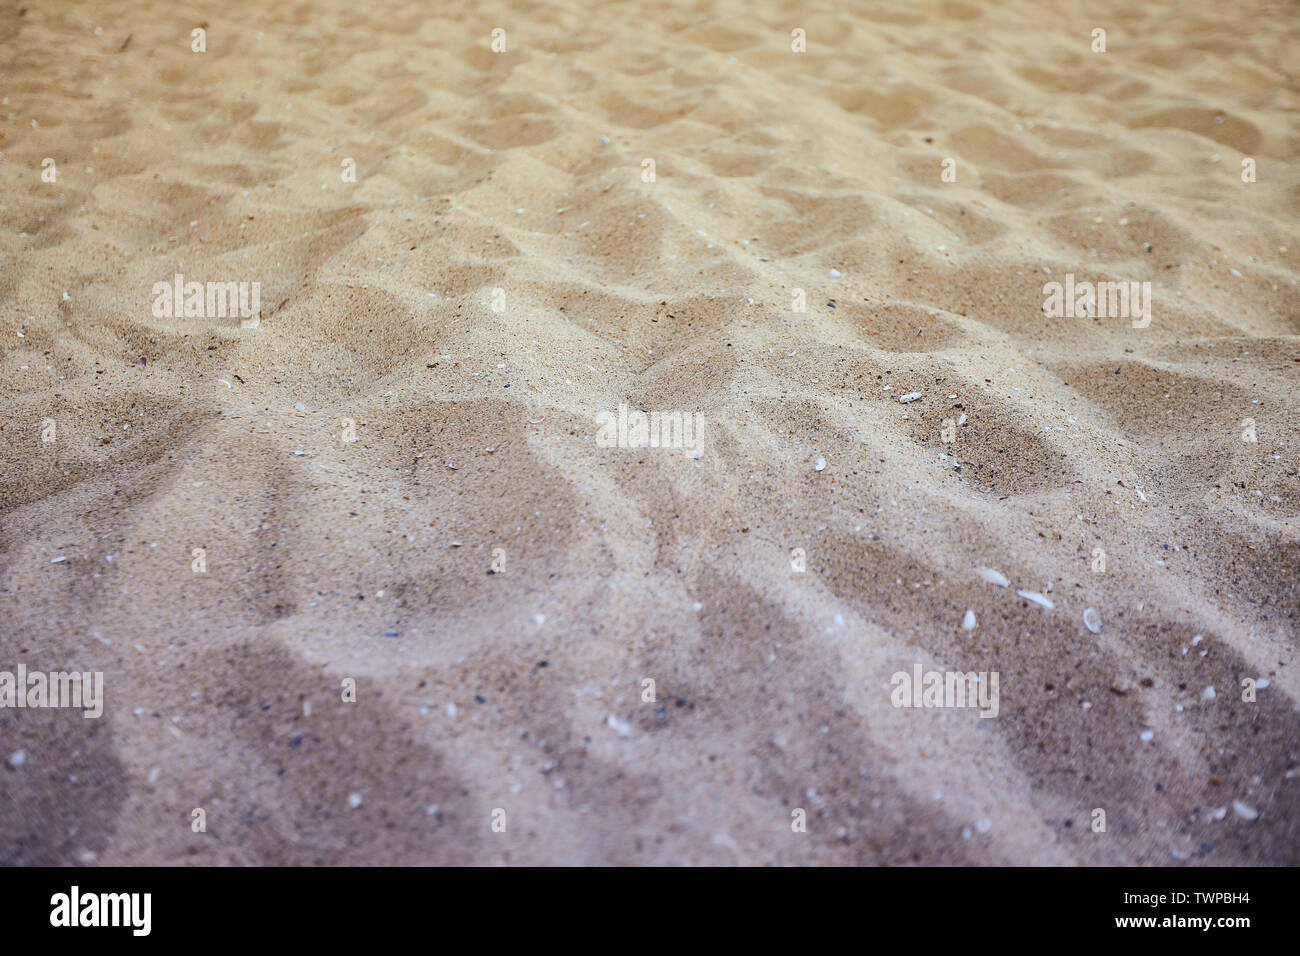 Fine beach sand in the summer sun - Stock Image